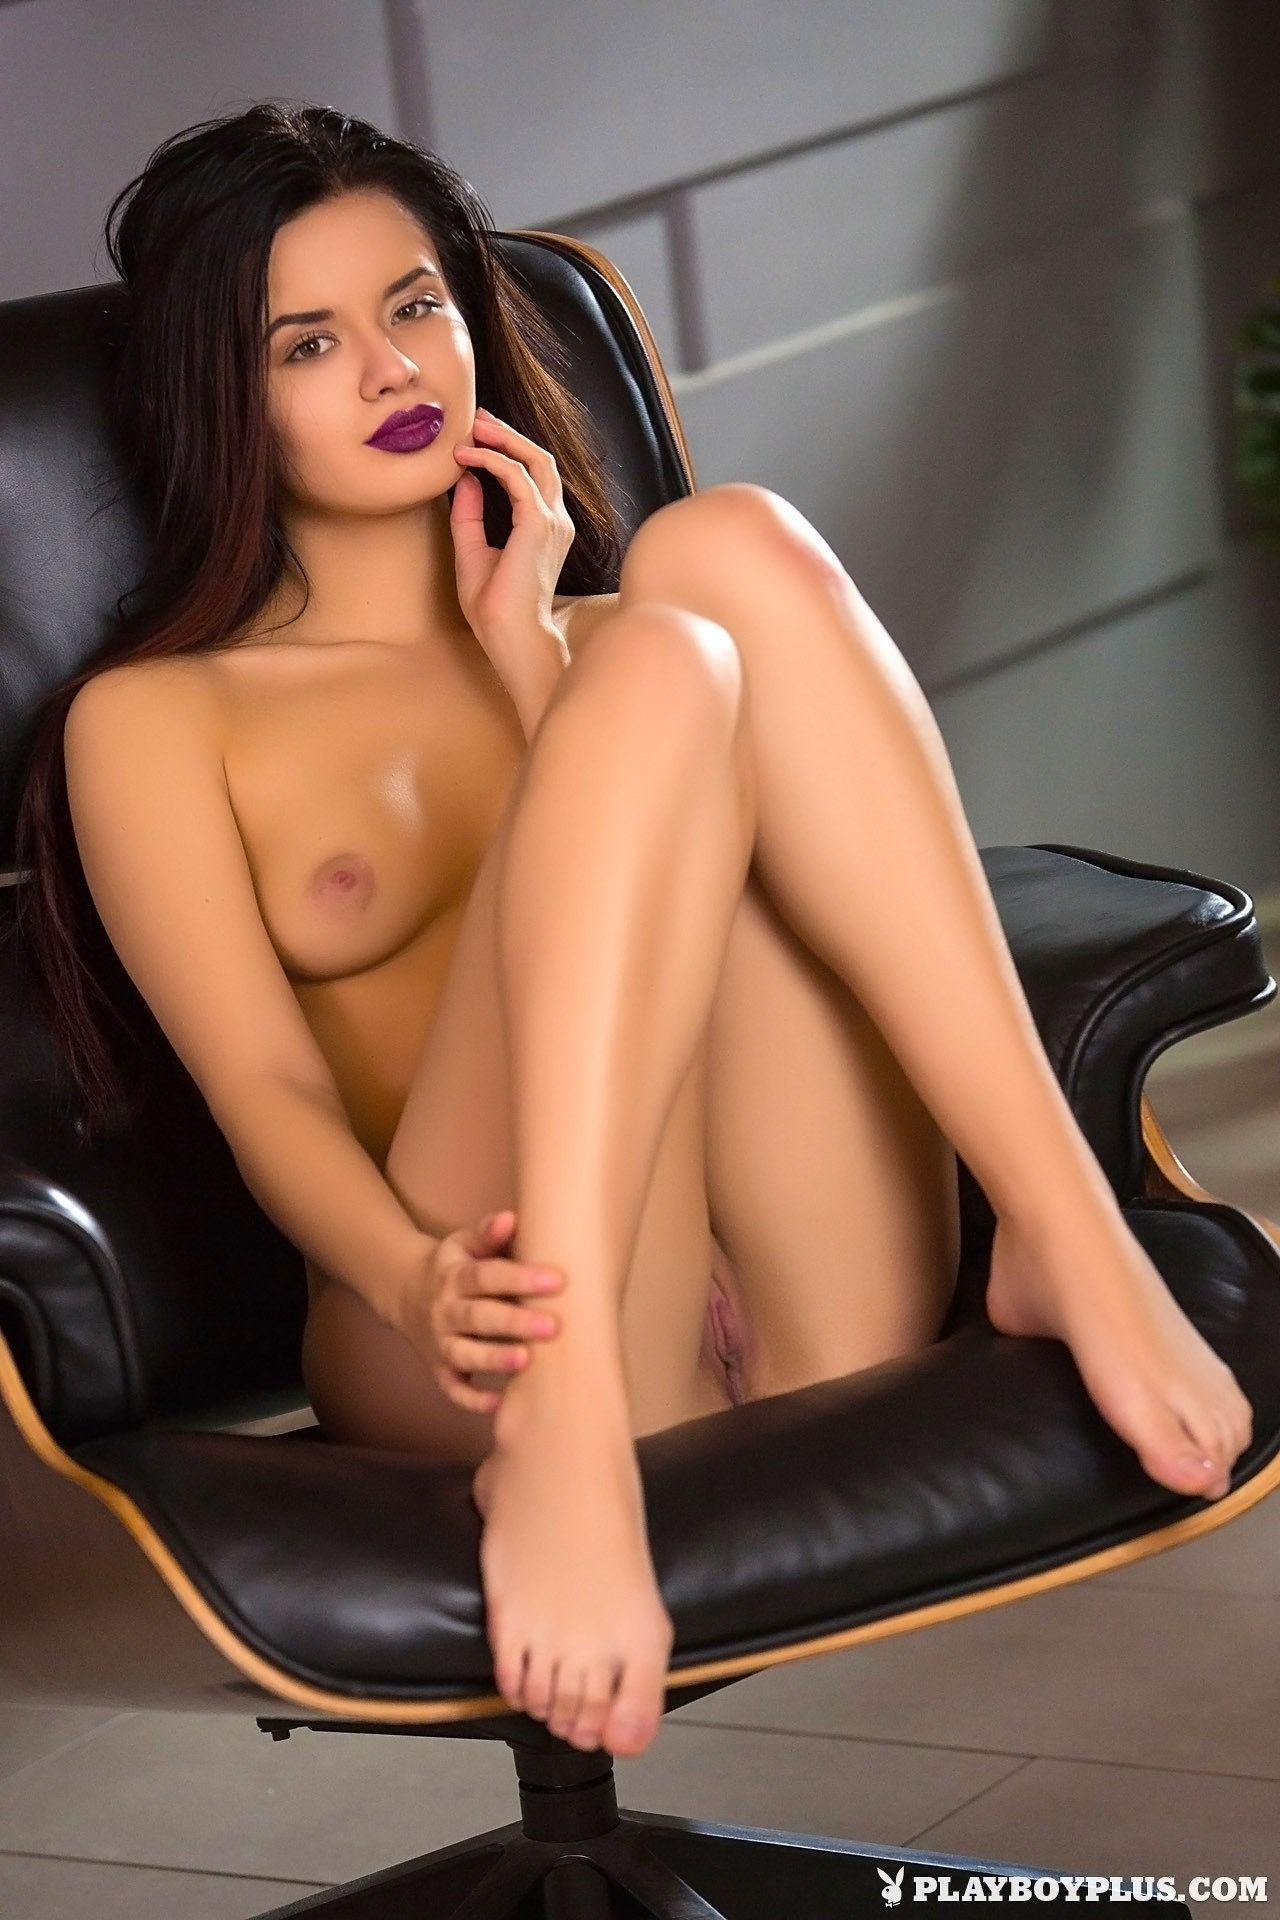 female nude photography seduction